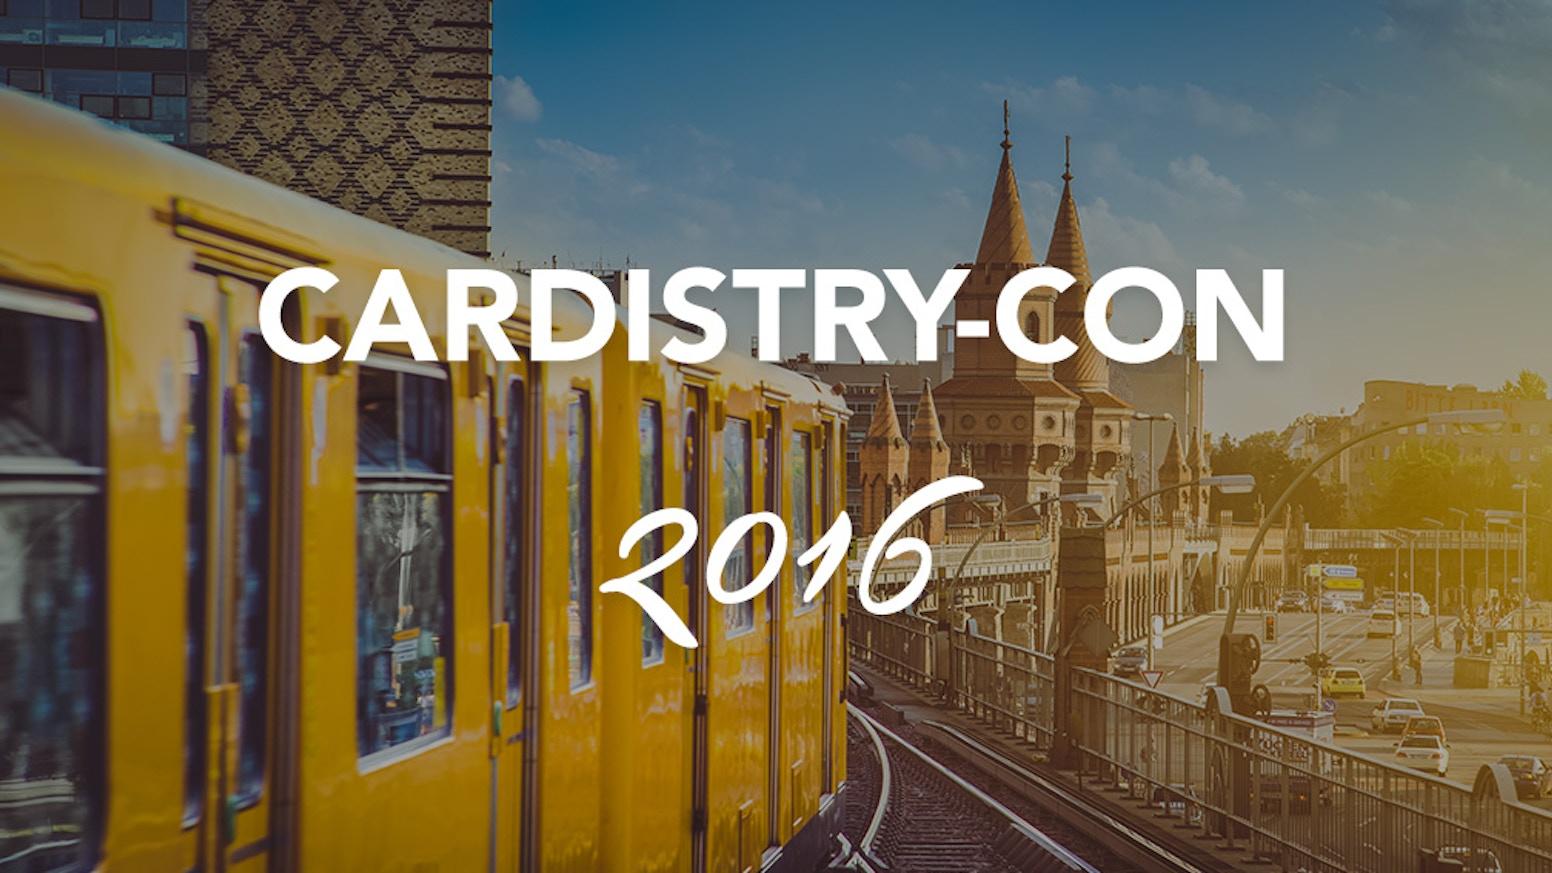 Global Cardistry Meetup.  Join us July 8-10 in Berlin, Germany.